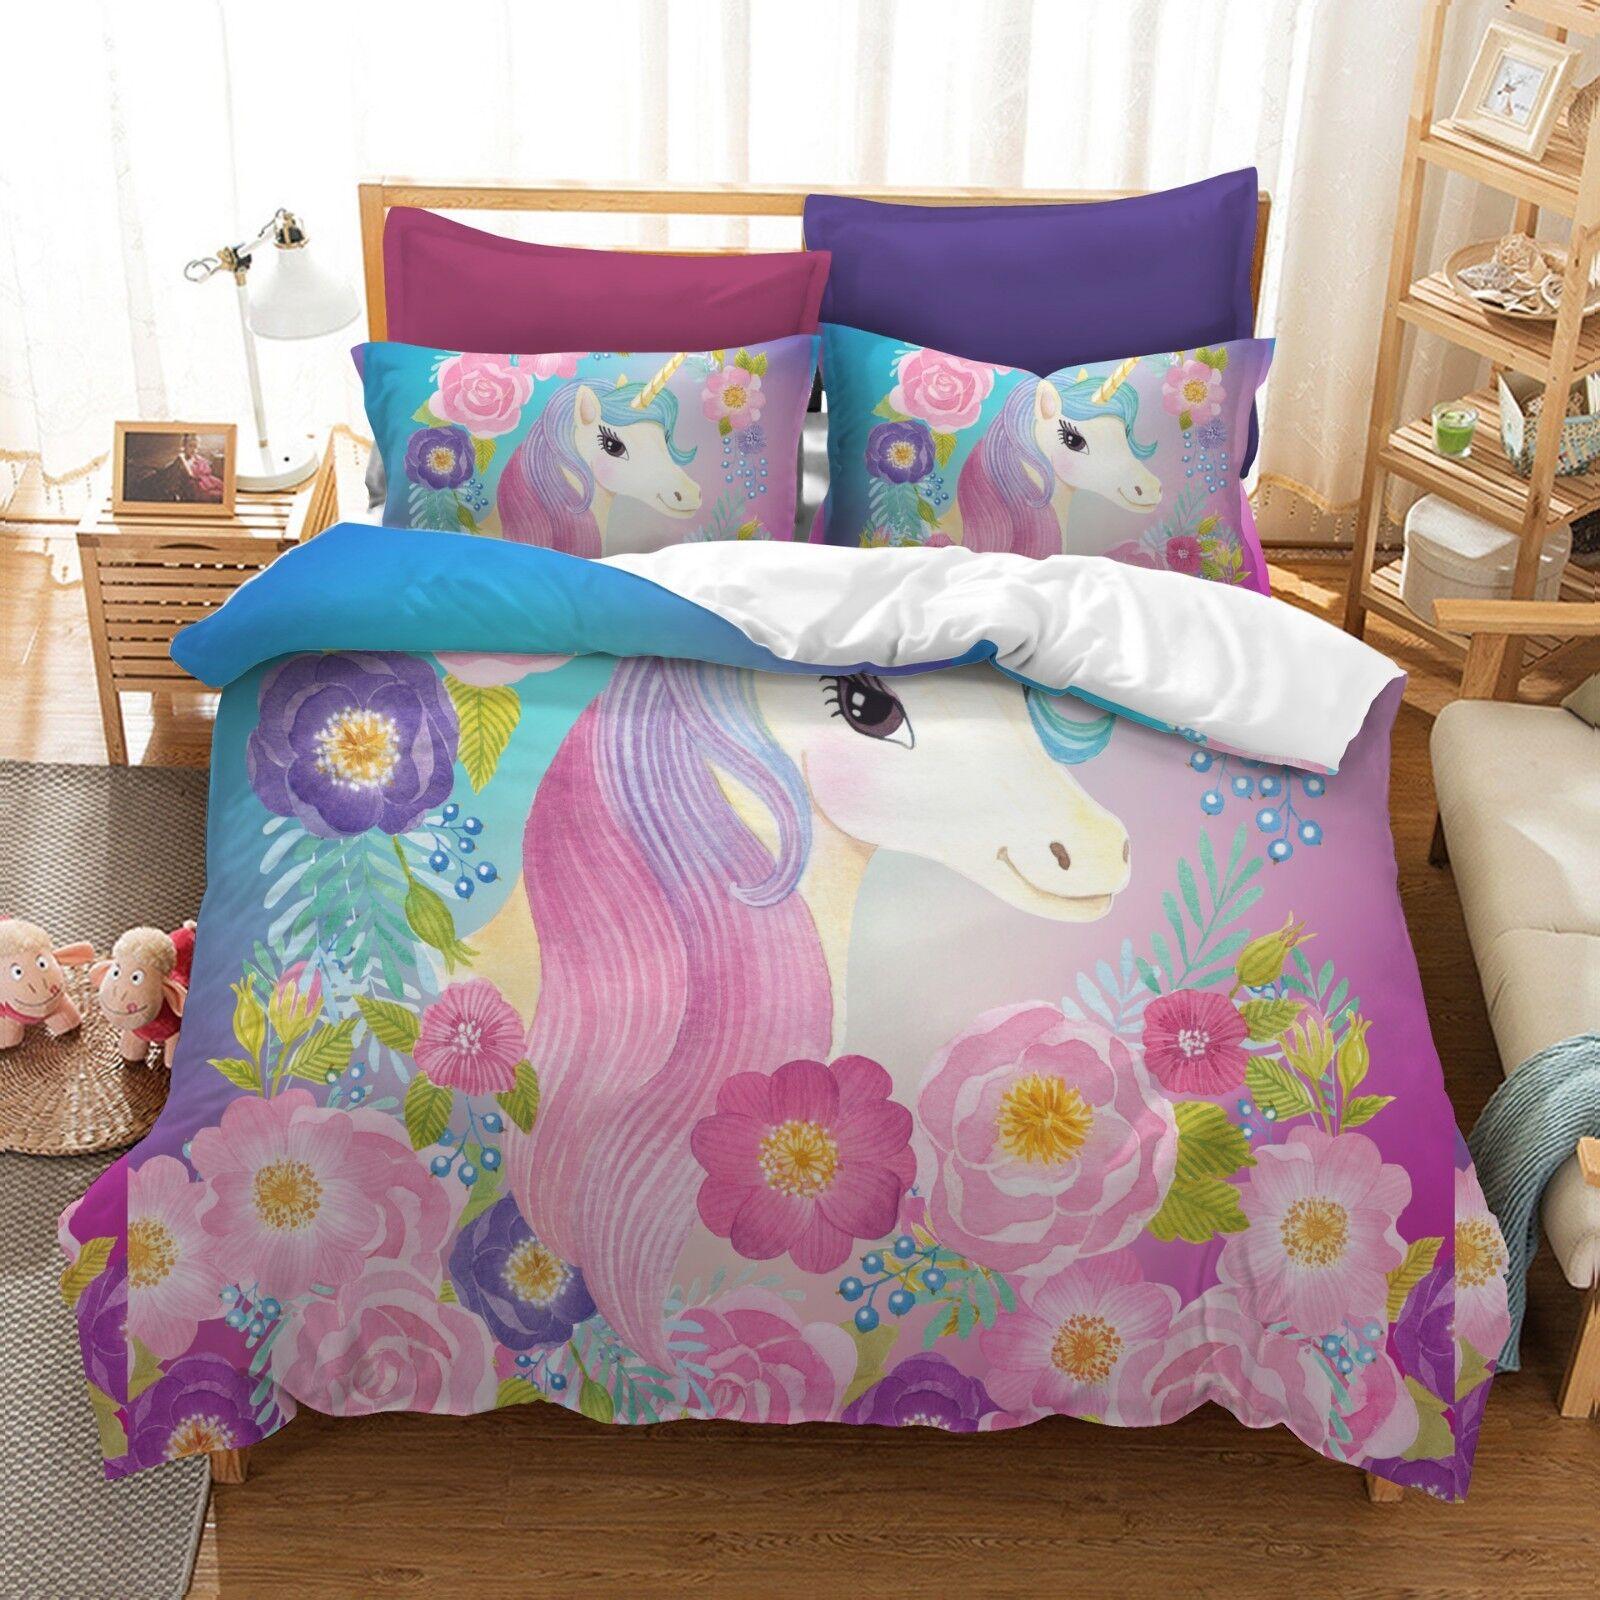 3D Fantasy Unicorn Duvet Cover Kids Bedding Set Pillow Case Quilt Cover Flowers